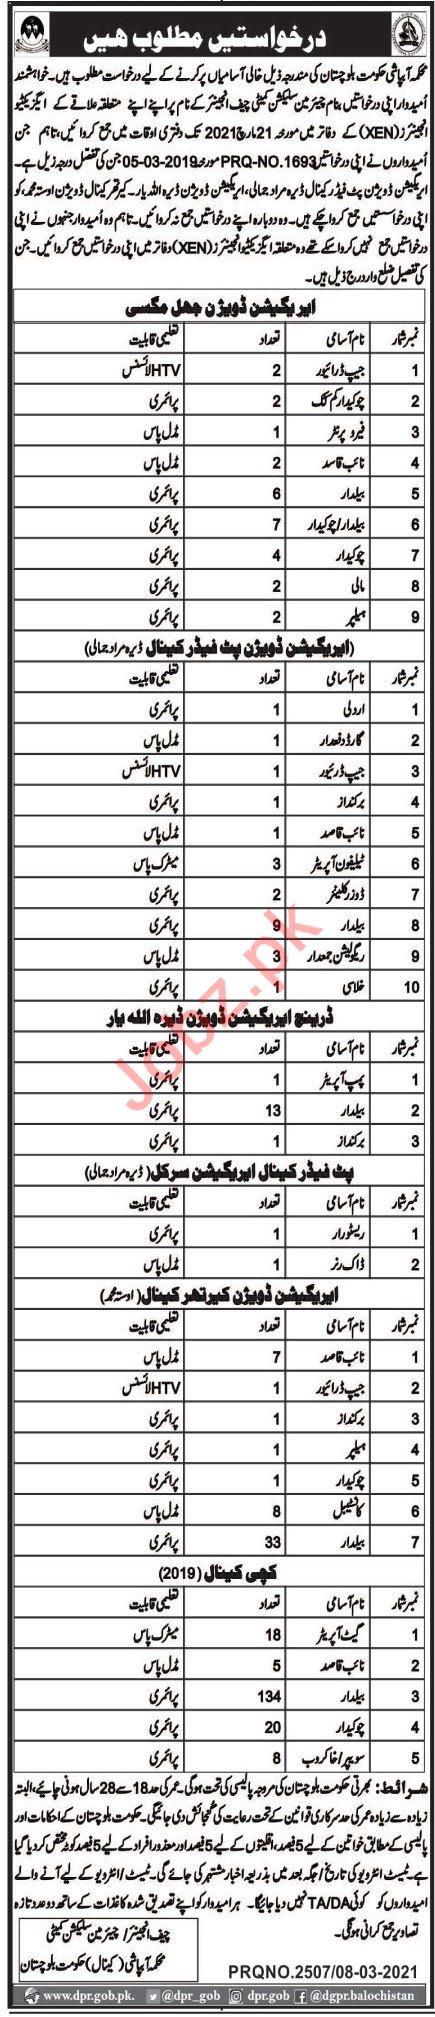 Irrigation Department Balochistan Jobs 2021 for Drivers